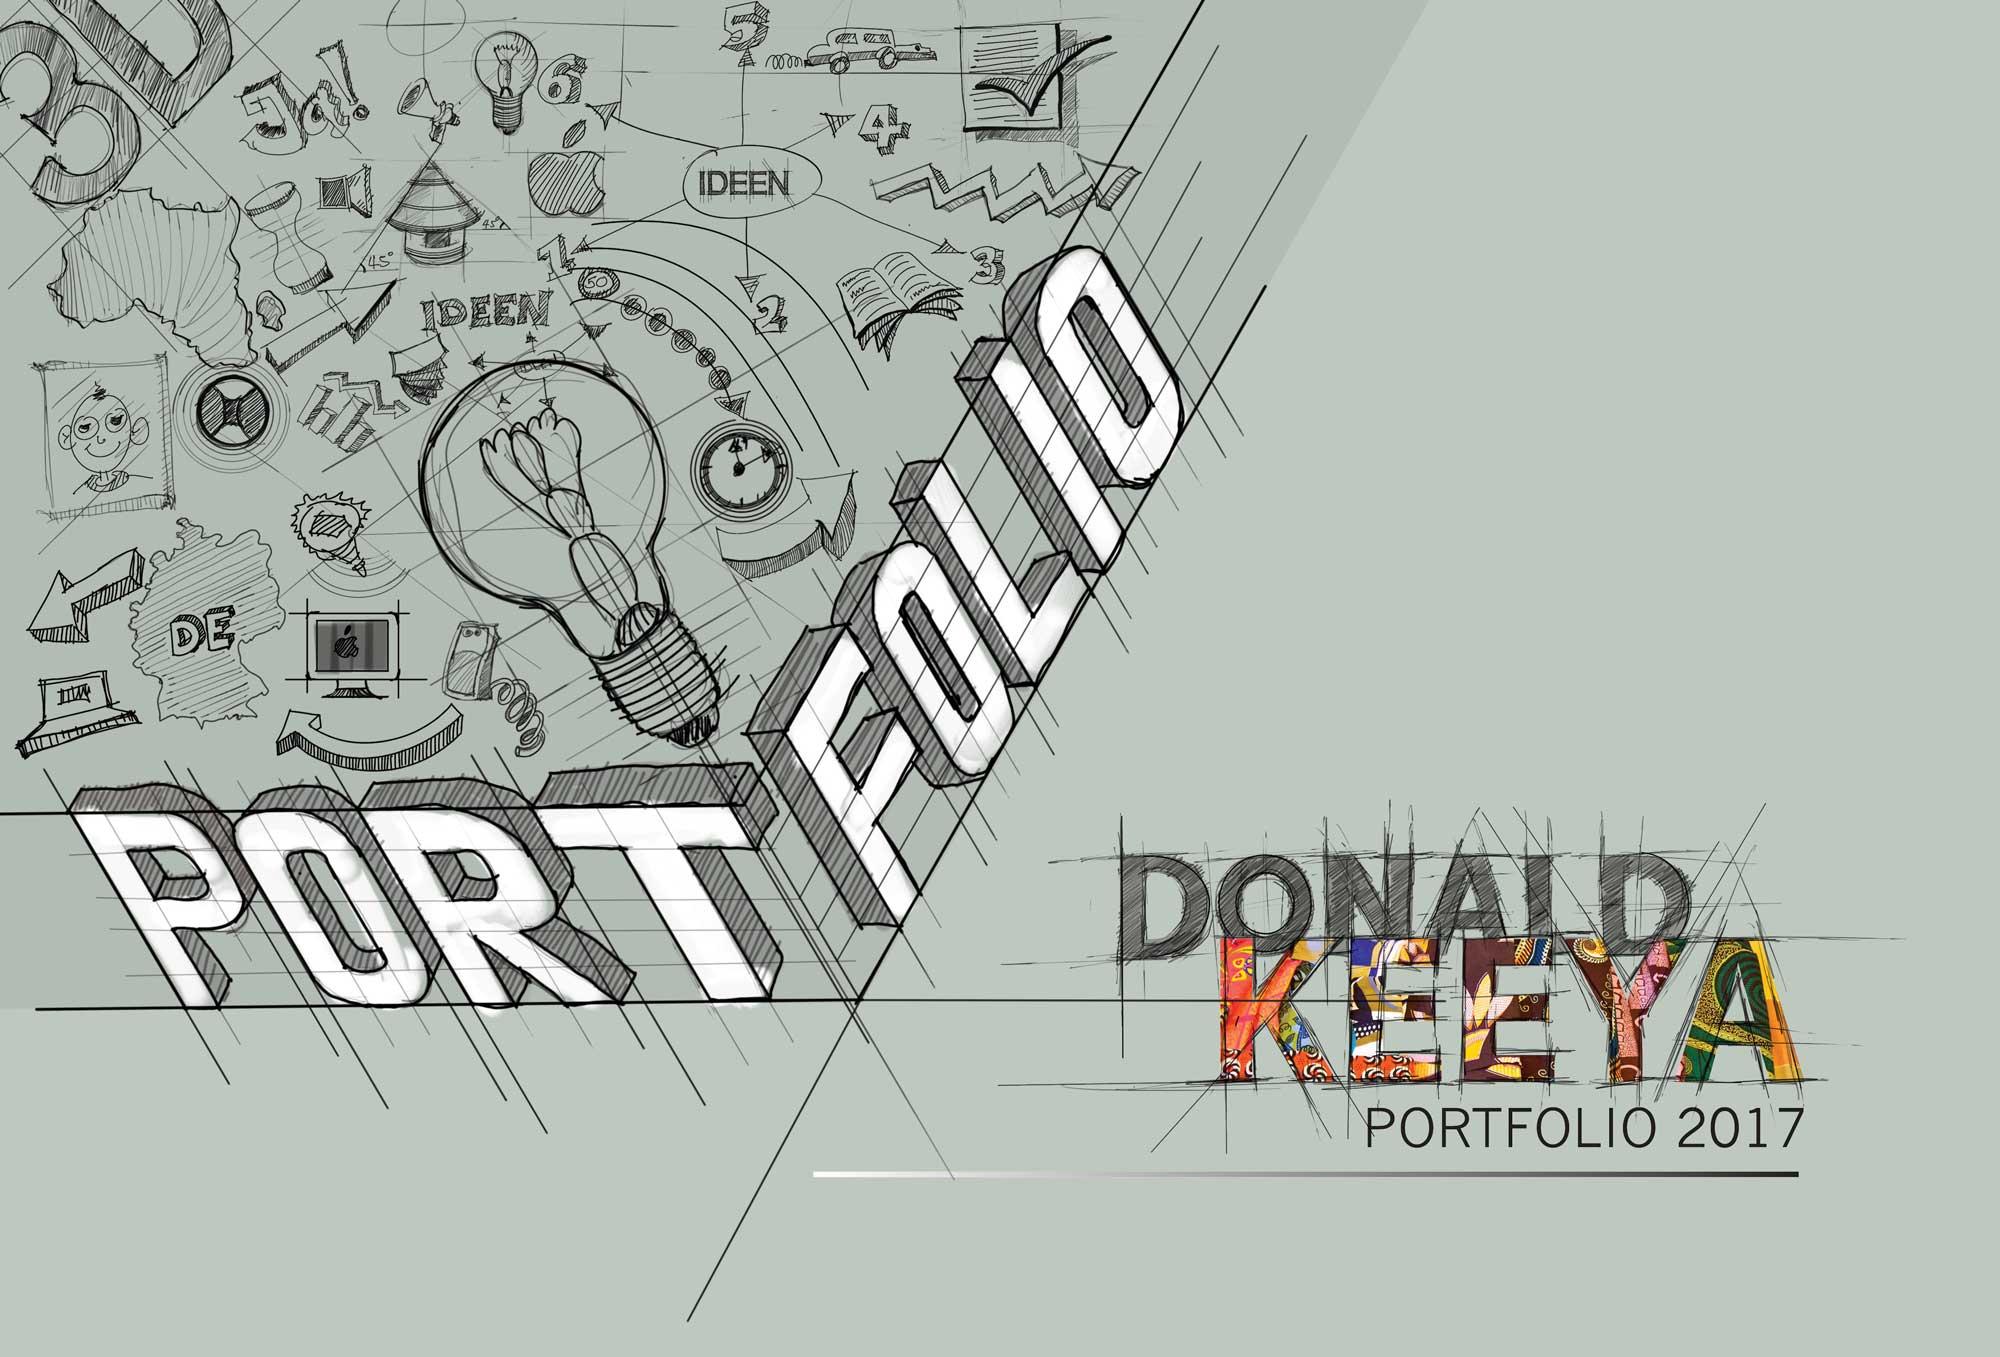 Portfolio Cover Image